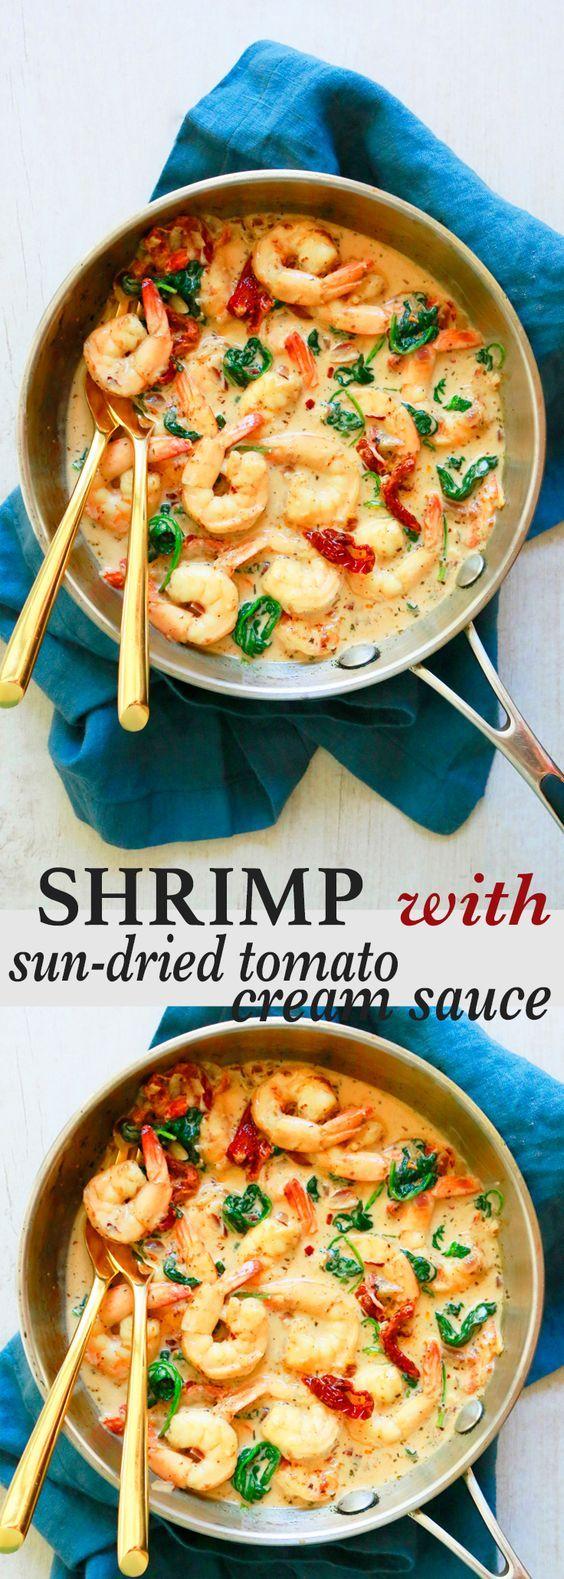 dinner recipes | shrimp recipe | easy dinner recipes | quick dinner recipes | sun dried tomato sauce | creamy sauce | parmesan cheese